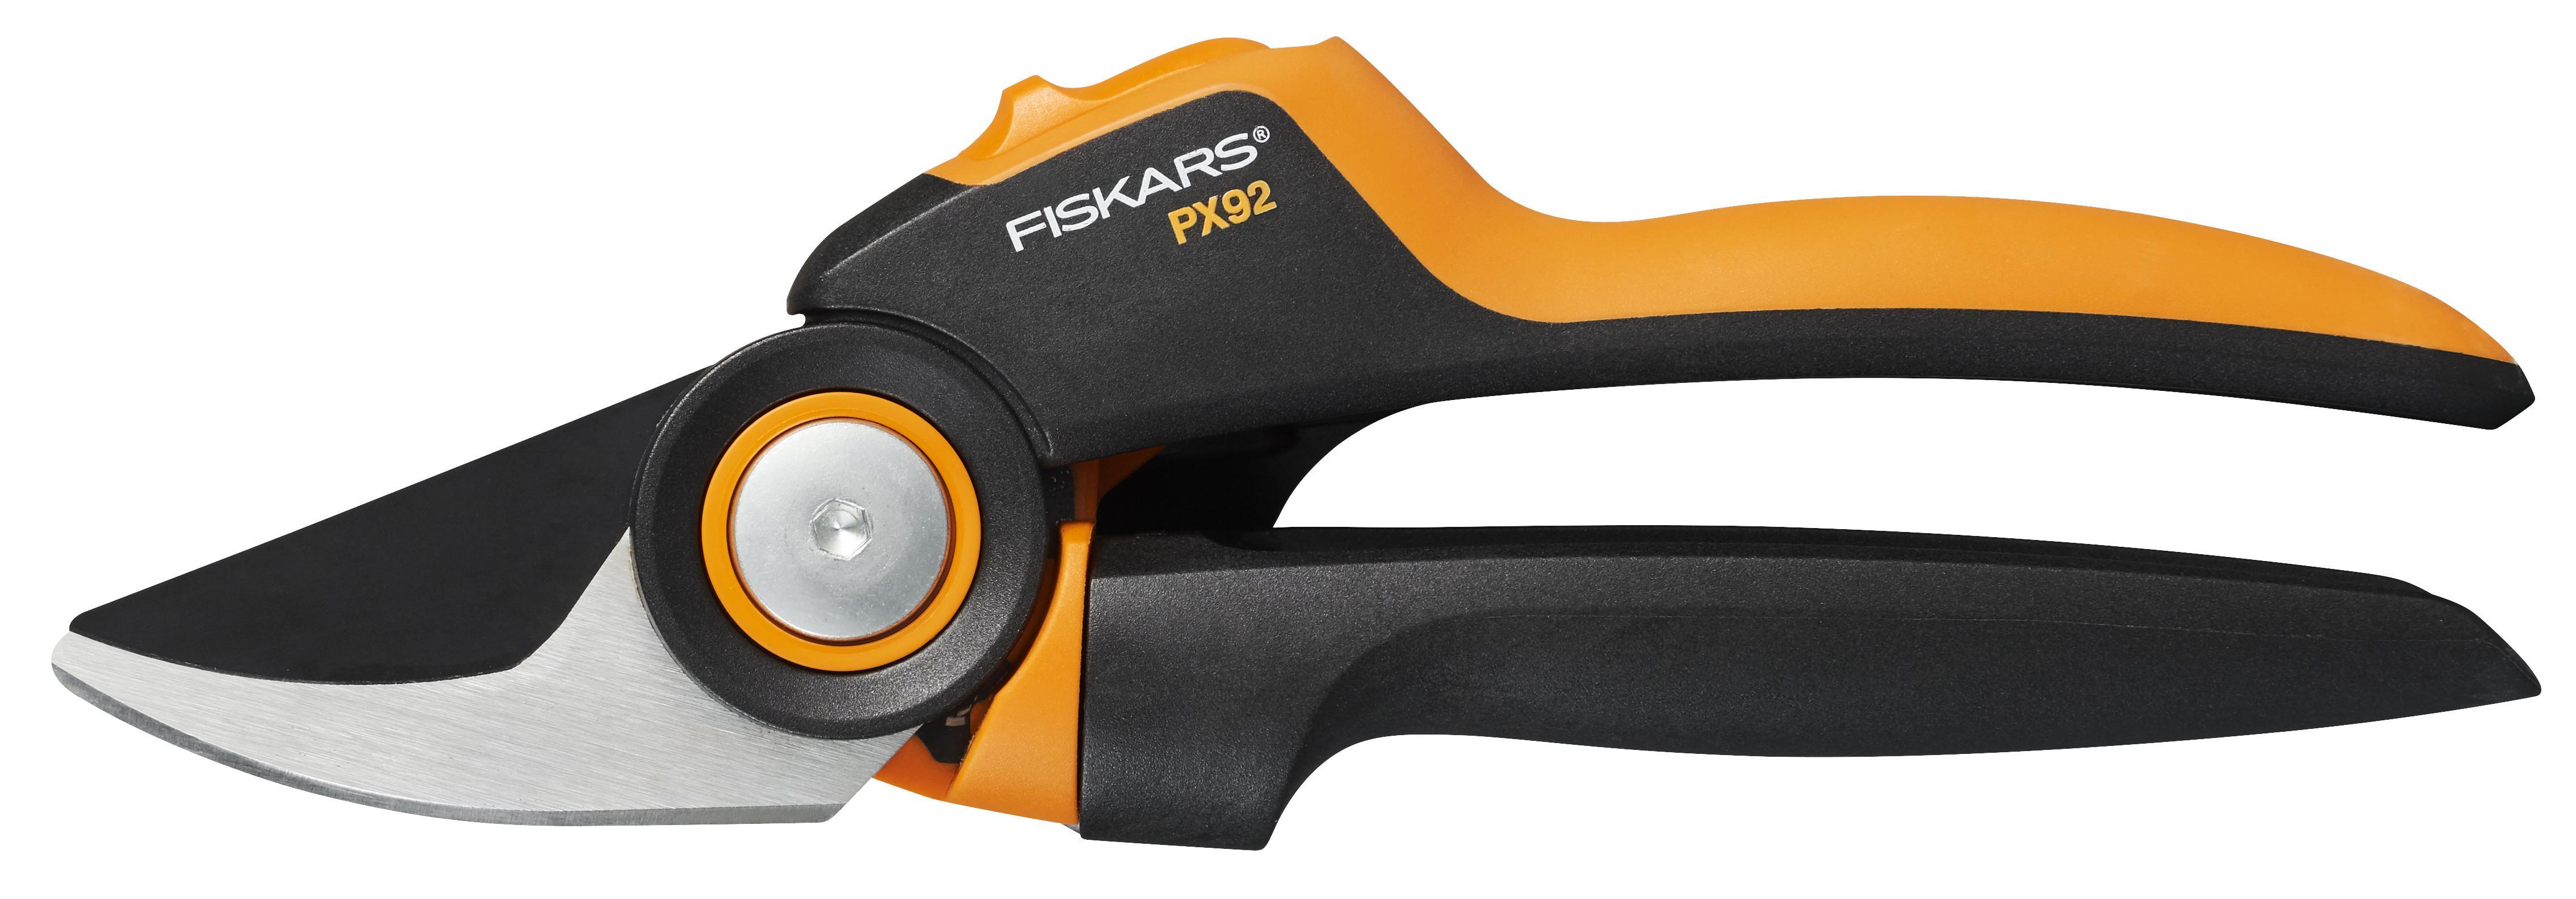 Секатор Fiskars Power gear m px92 секатор fiskars p44 111440